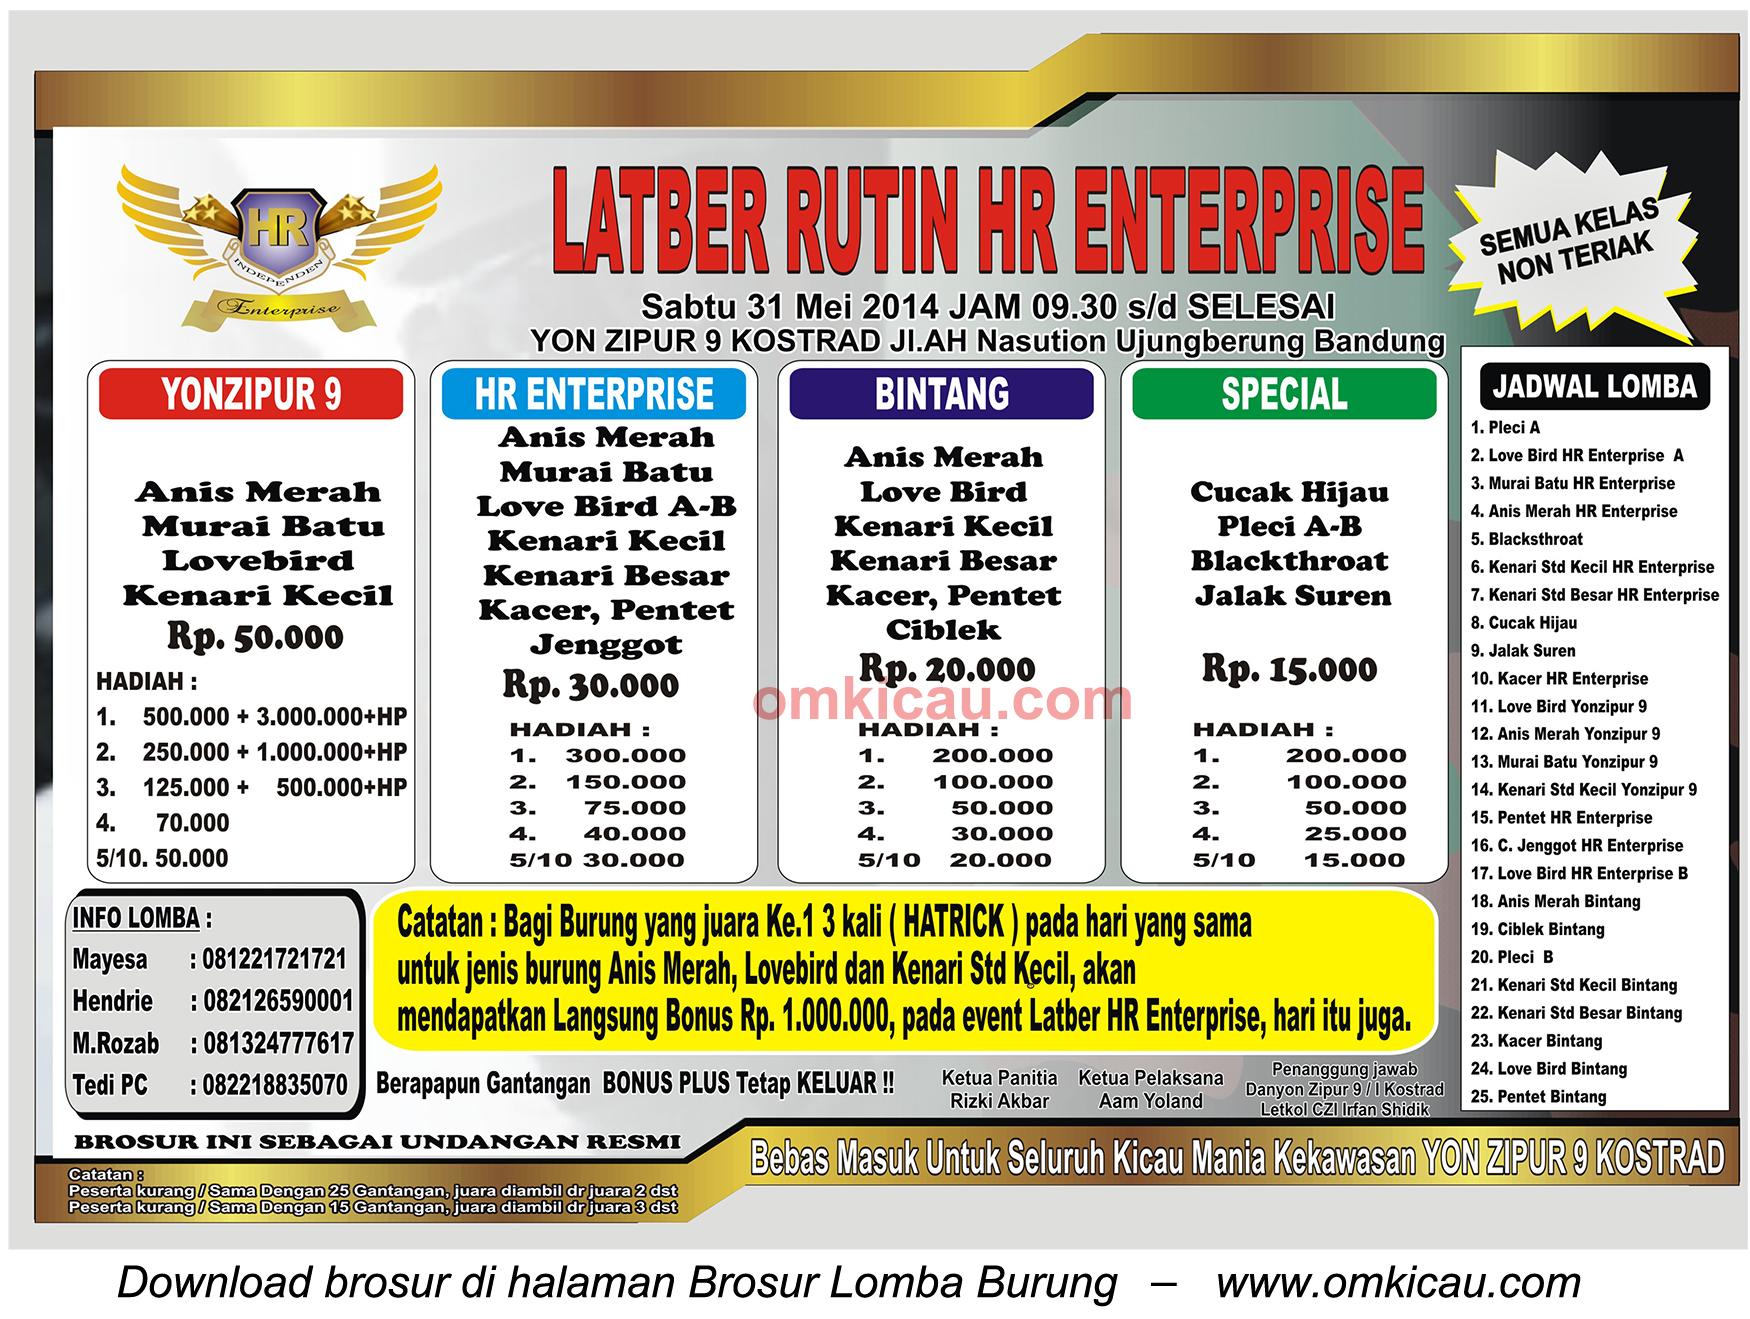 Brosur Latber Rutin HR Enterprise, Bandung, 31 Mei 2014